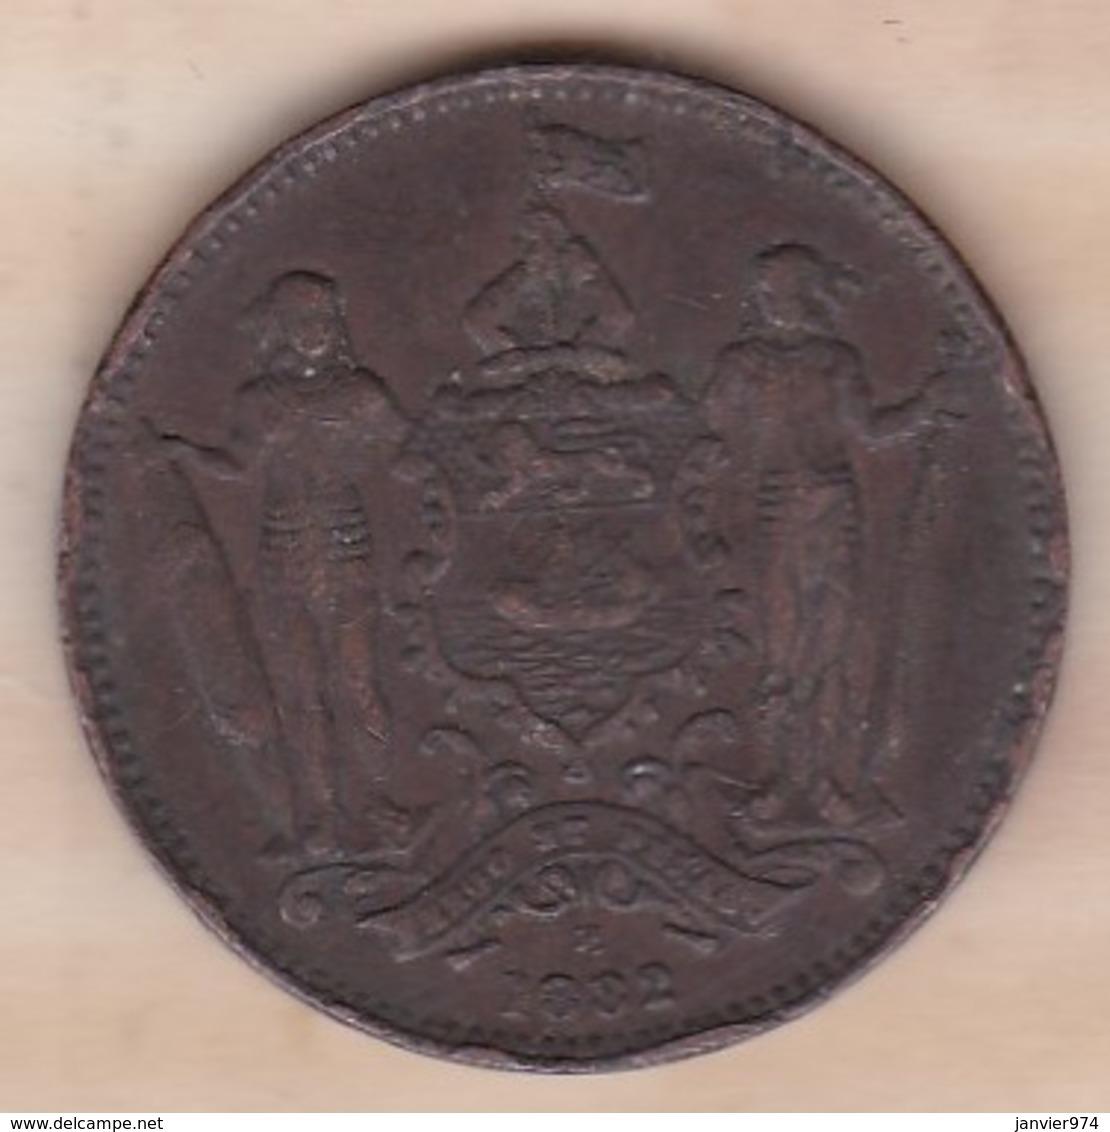 BRITISH NORTH BORNEO. ONE CENT 1882 H . VICTORIA. KM# 2 - Malaysie